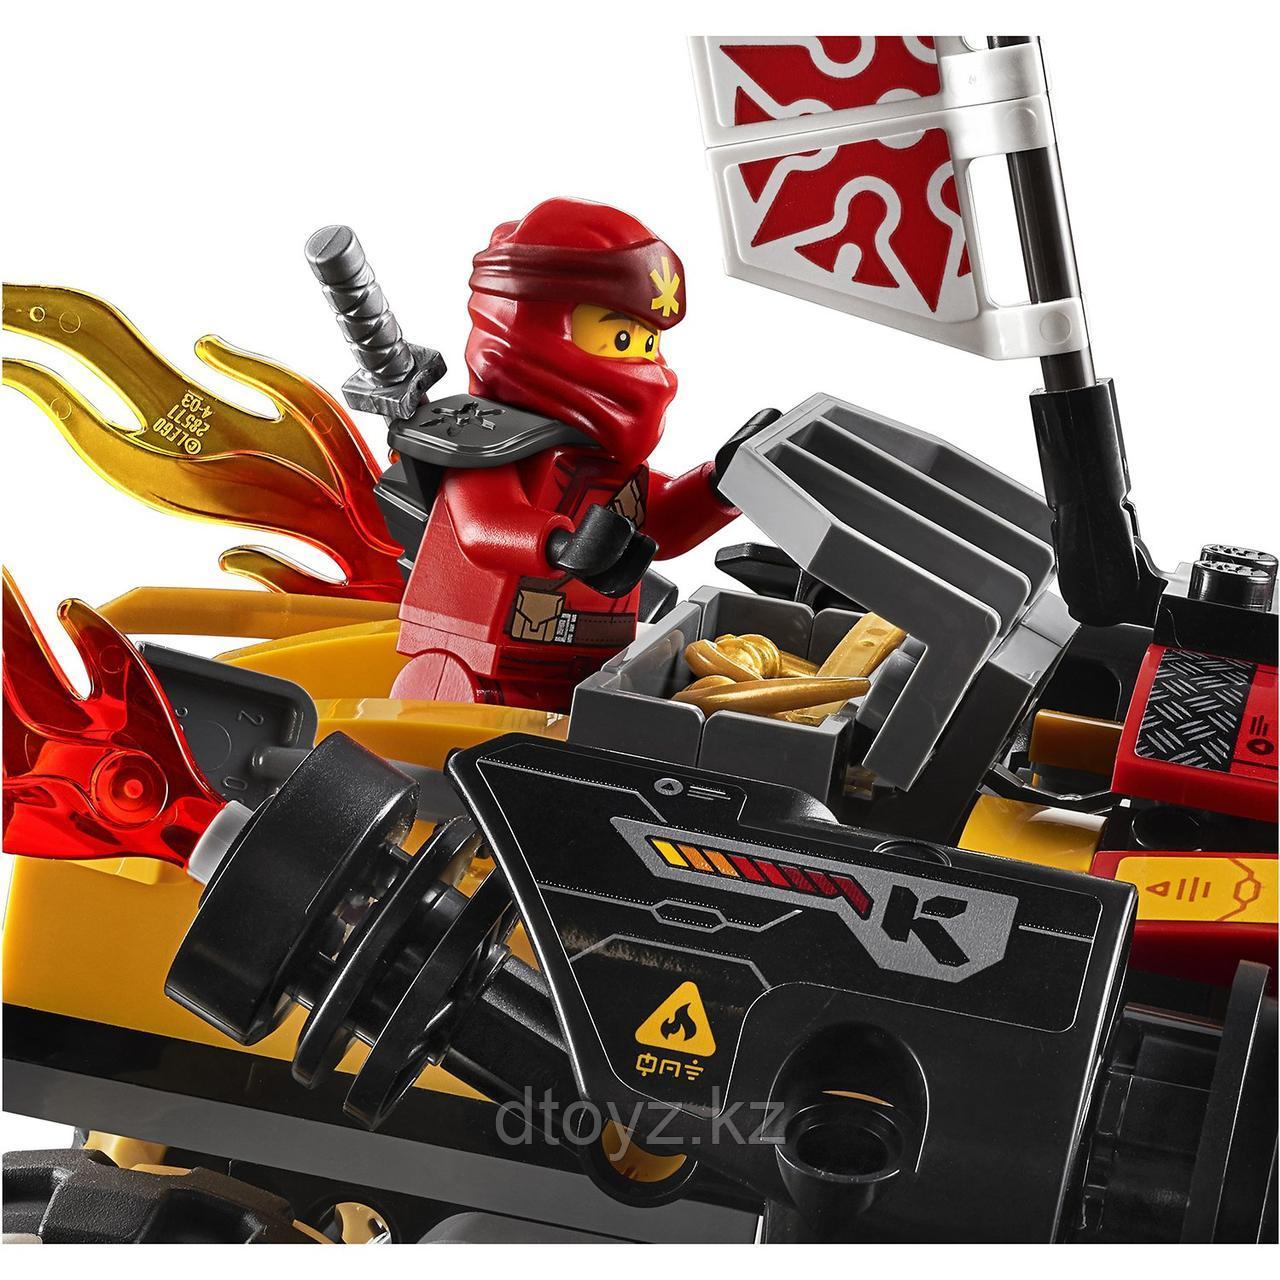 Lego Ninjago 70675 Внедорожник Катана 4x4, Лего Ниндзяго - фото 10